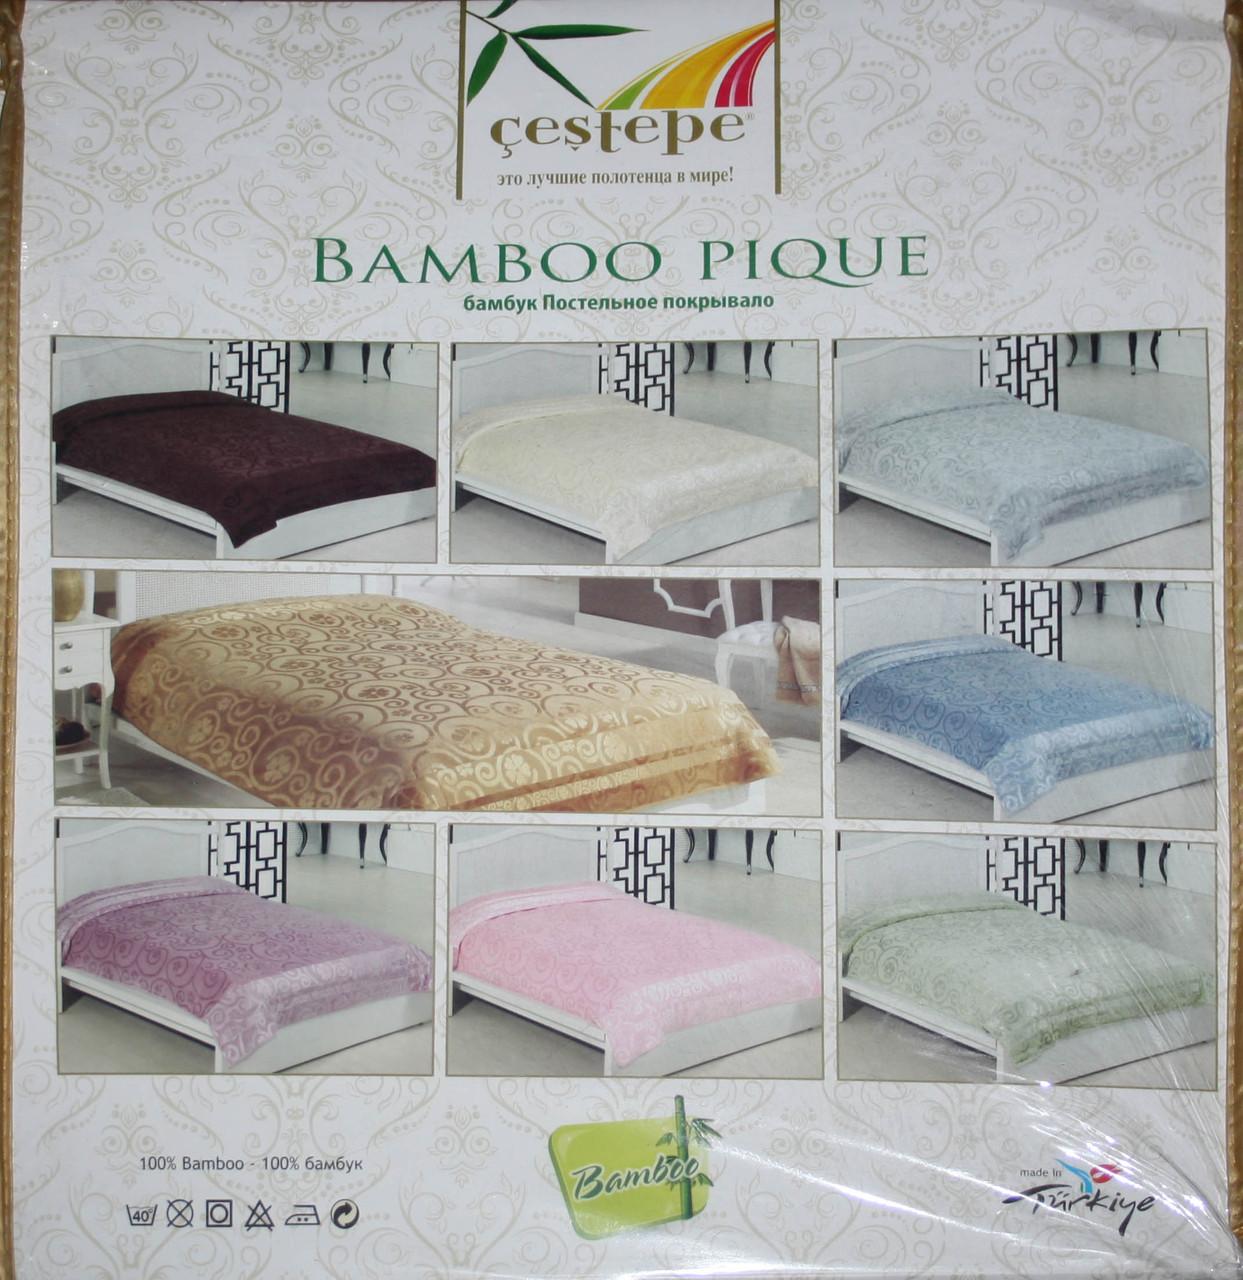 Бамбукова махрове простирадло Bamboo Pique Cestepe